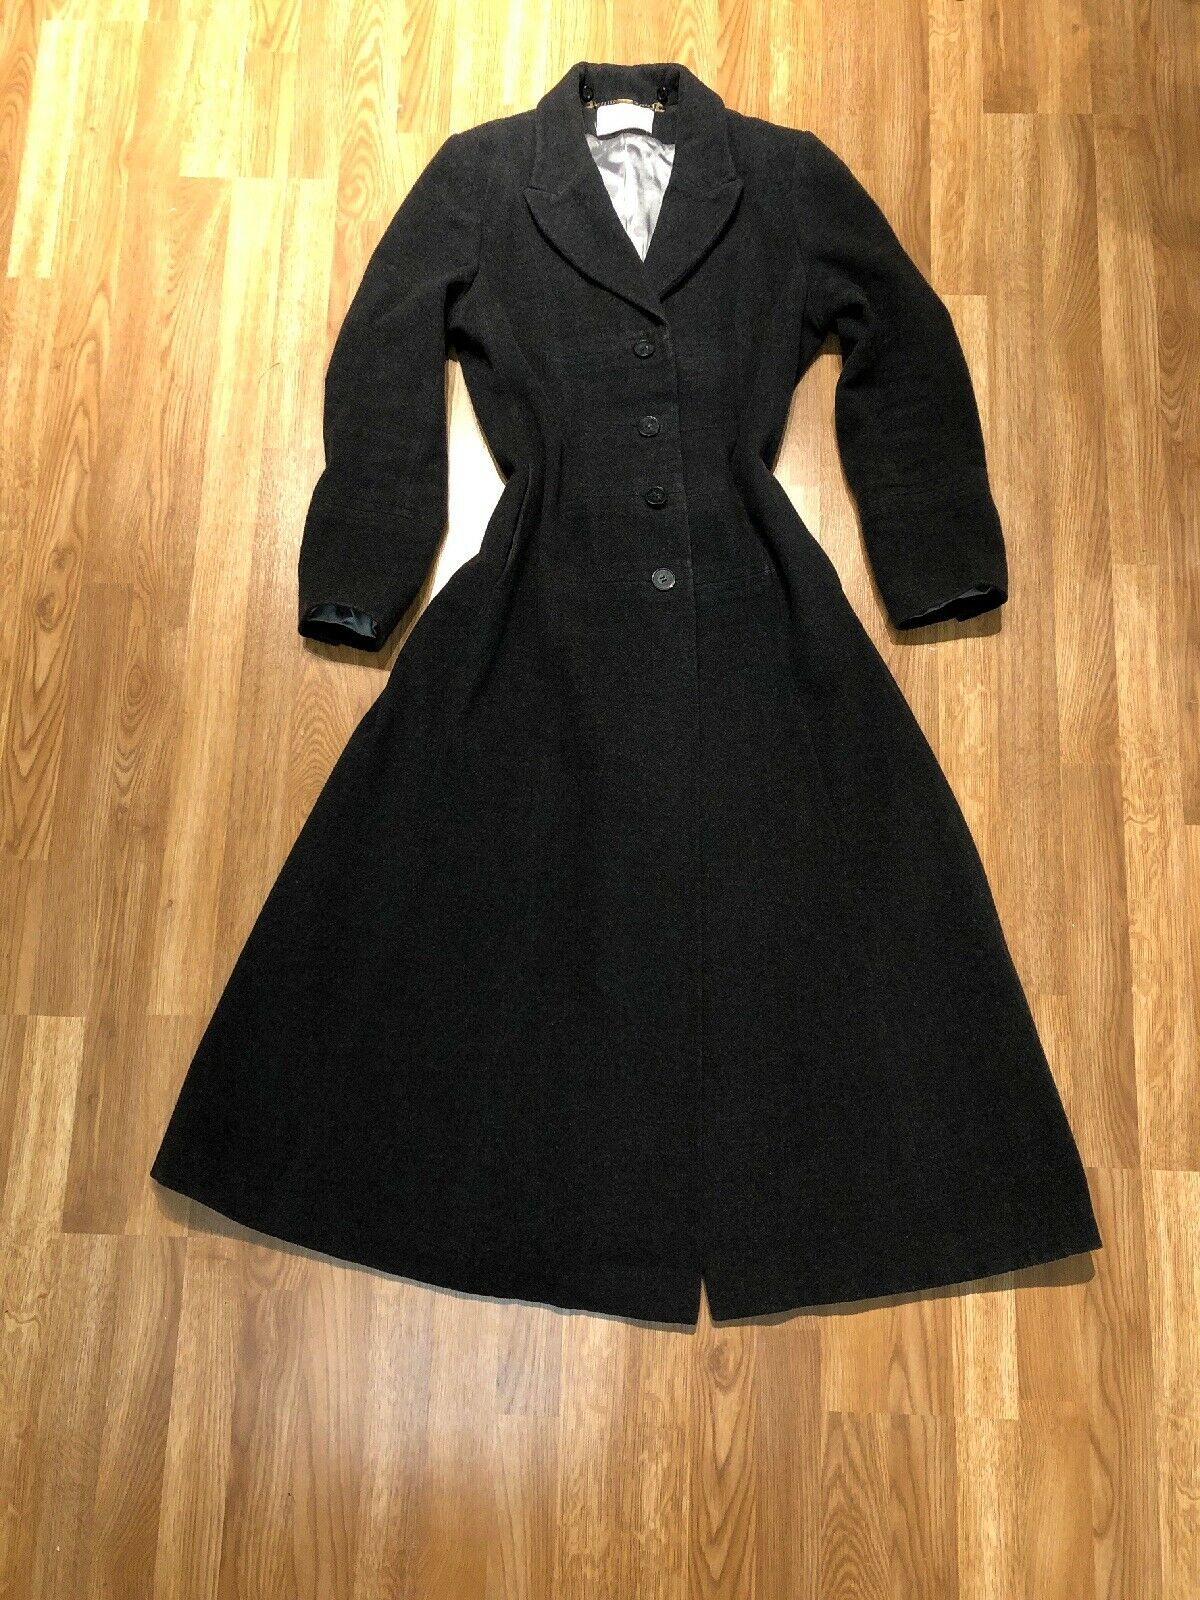 Vintage Victorian Style Ladies Long Riding   Elegant Overcoat - Cashmere Blend M